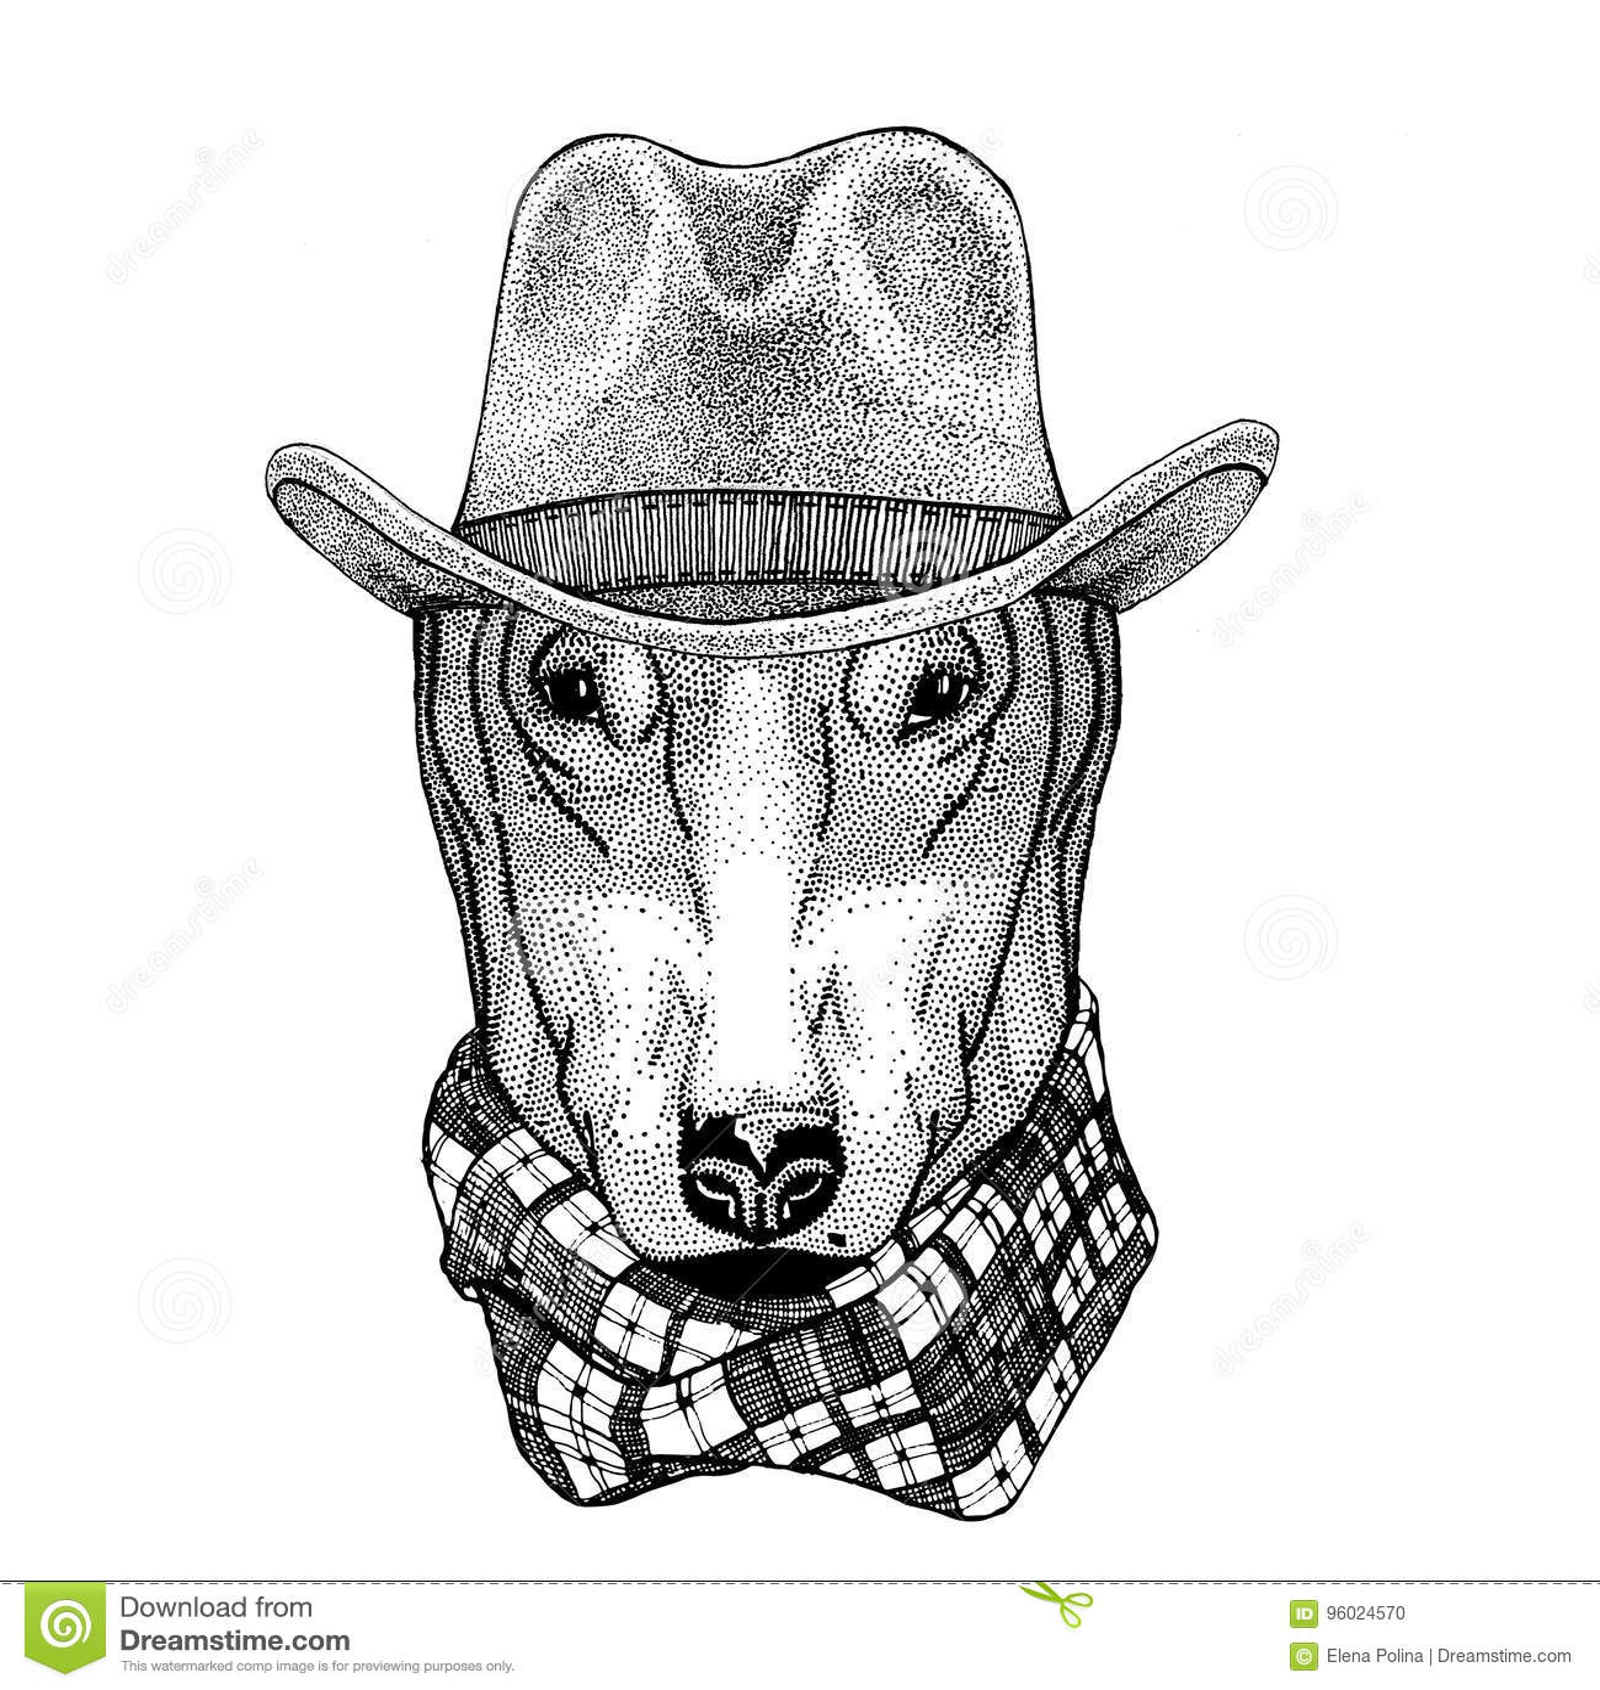 DOG for t-shirt design Wild animal wearing cowboy hat Wild west animal Cowboy animal T-shirt, poster, banner, badge